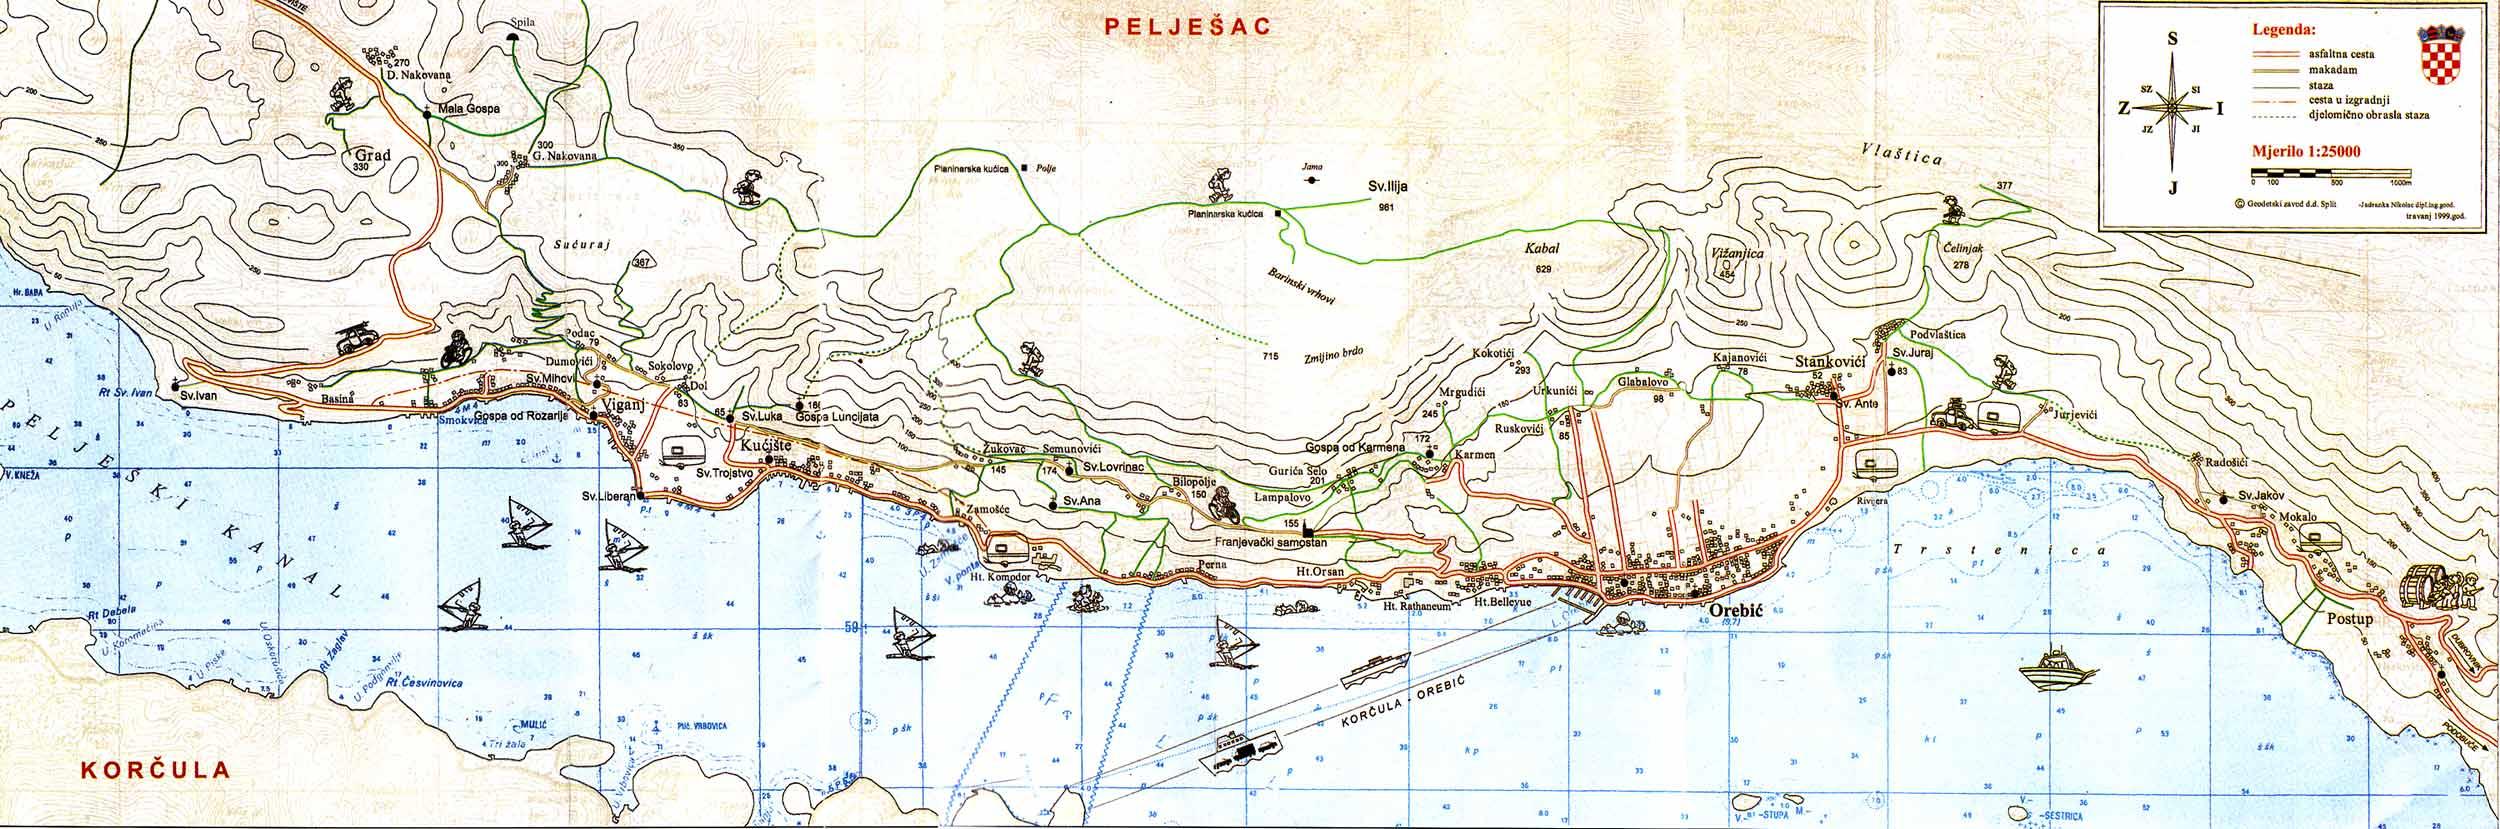 Sveti Ilija - Peljesac Map